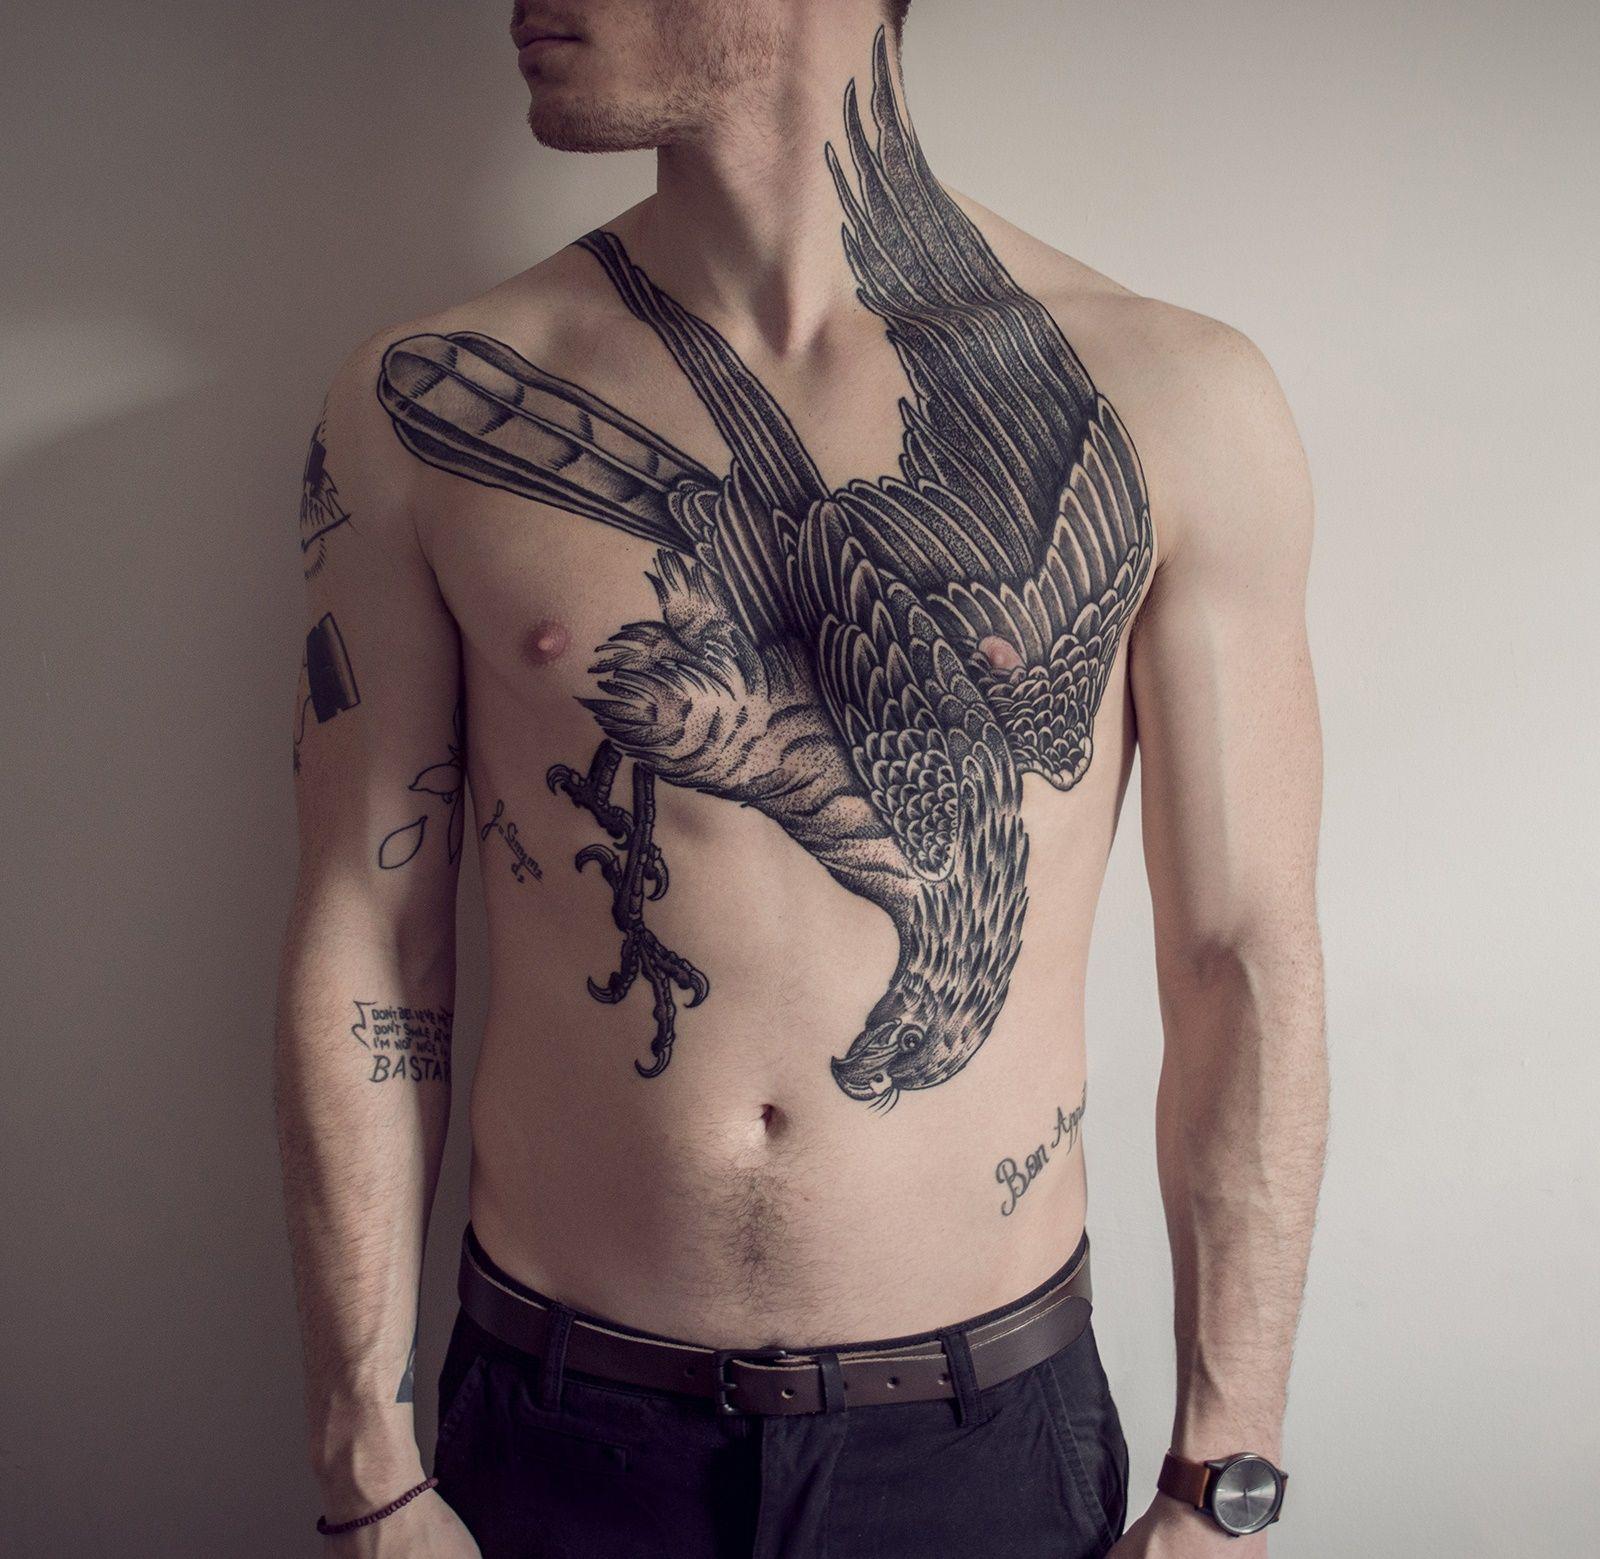 Badass Pigeon By Mxm At Sang Bleu Tattoo London Uk Tats